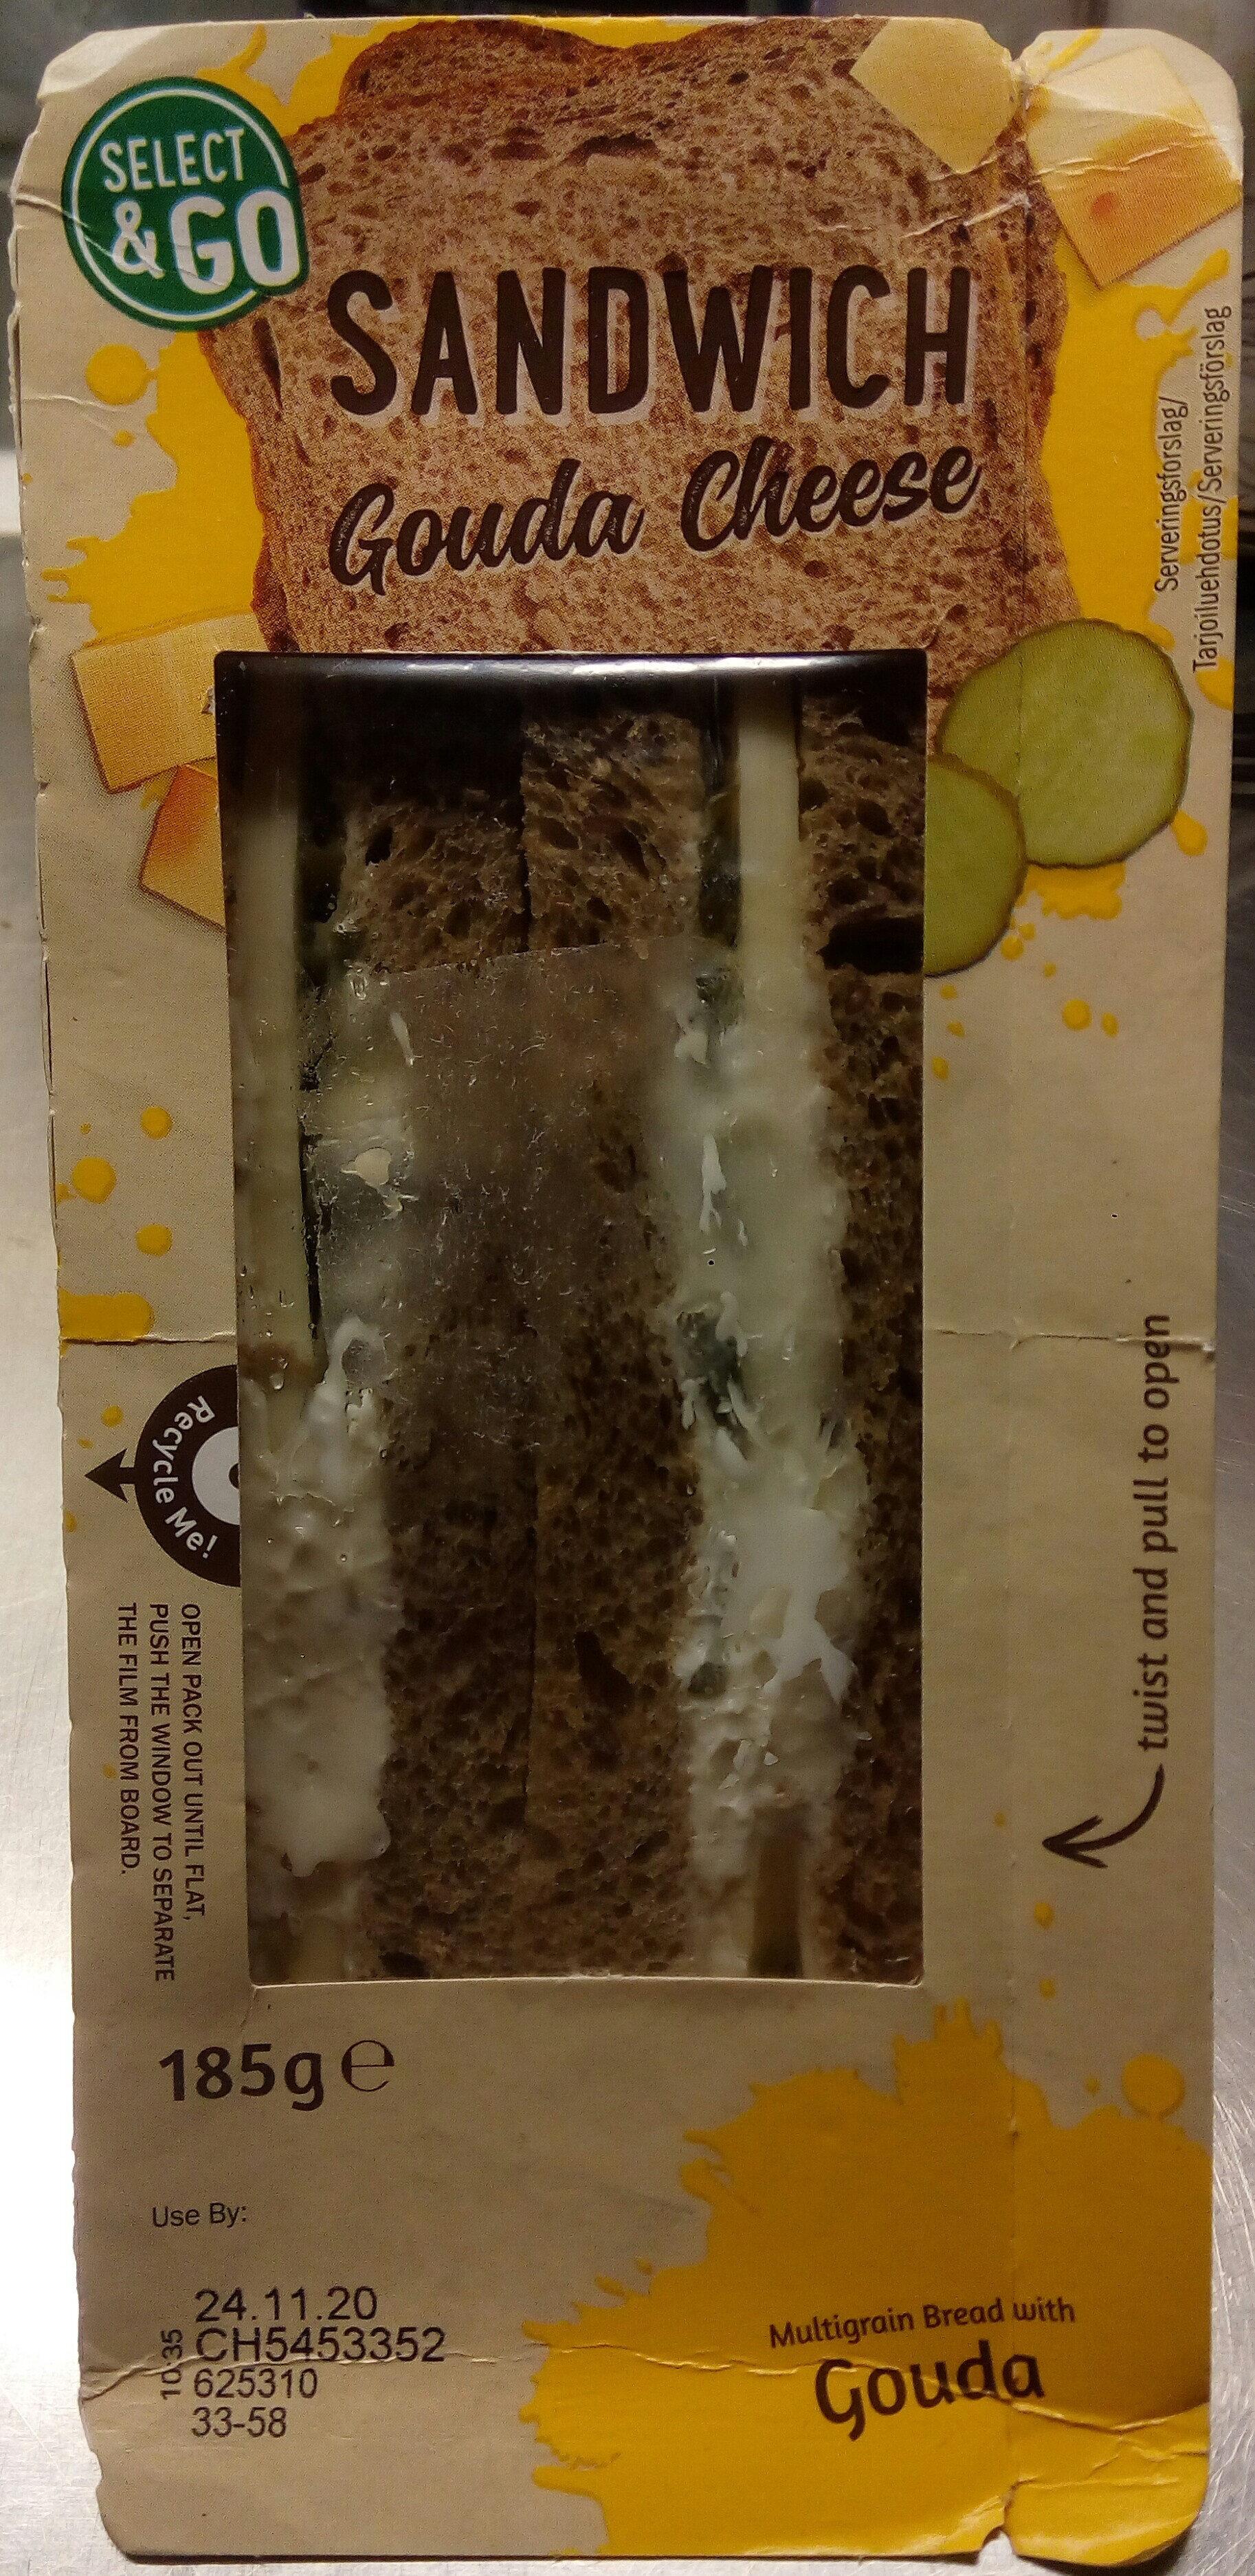 Select & Go Sandwich Gouda Cheese - Produit - sv